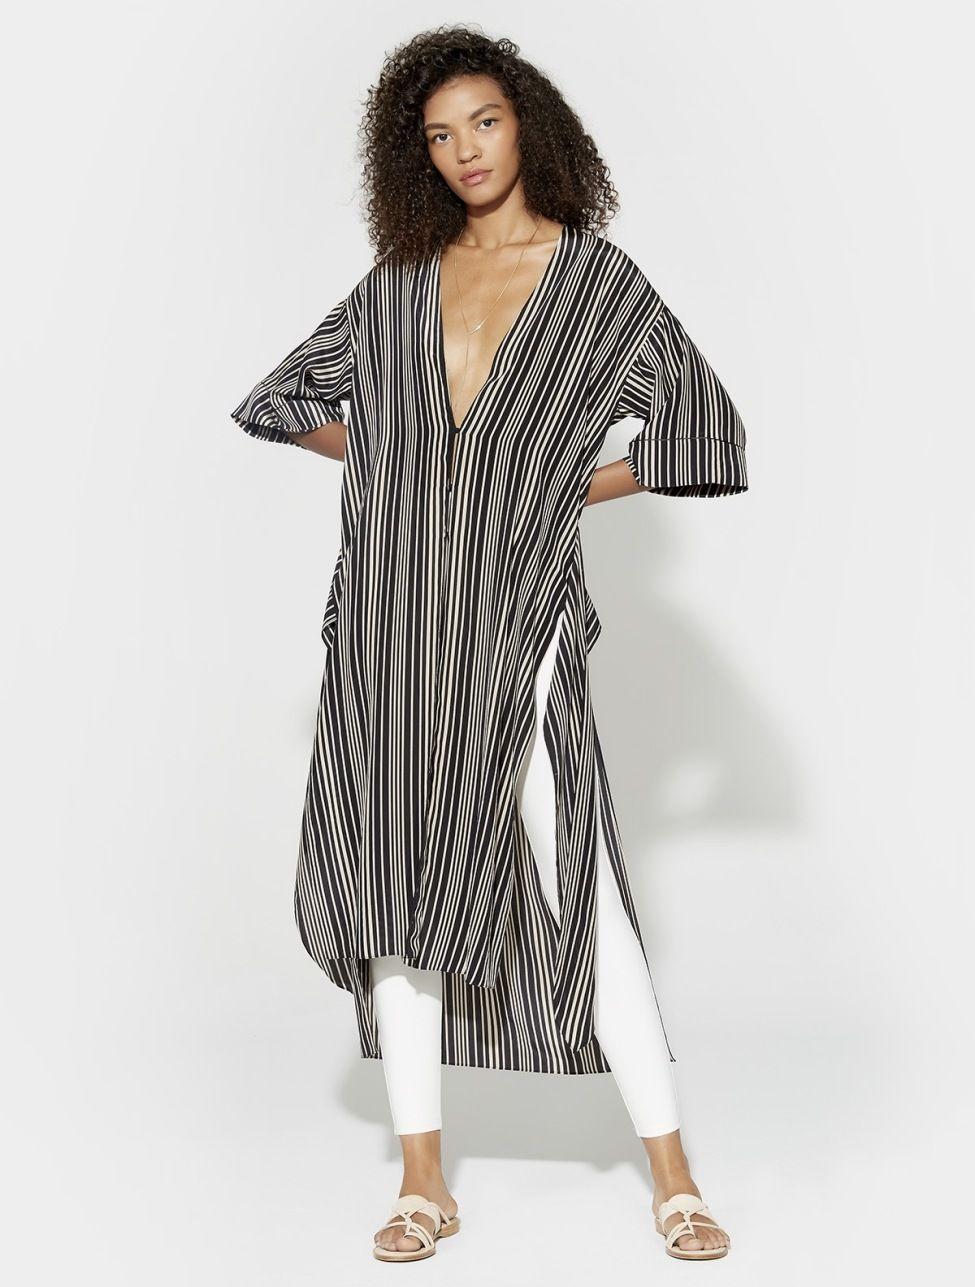 Striped Silk Kimono Kimono, Stripe silk, Silk kimono jacket